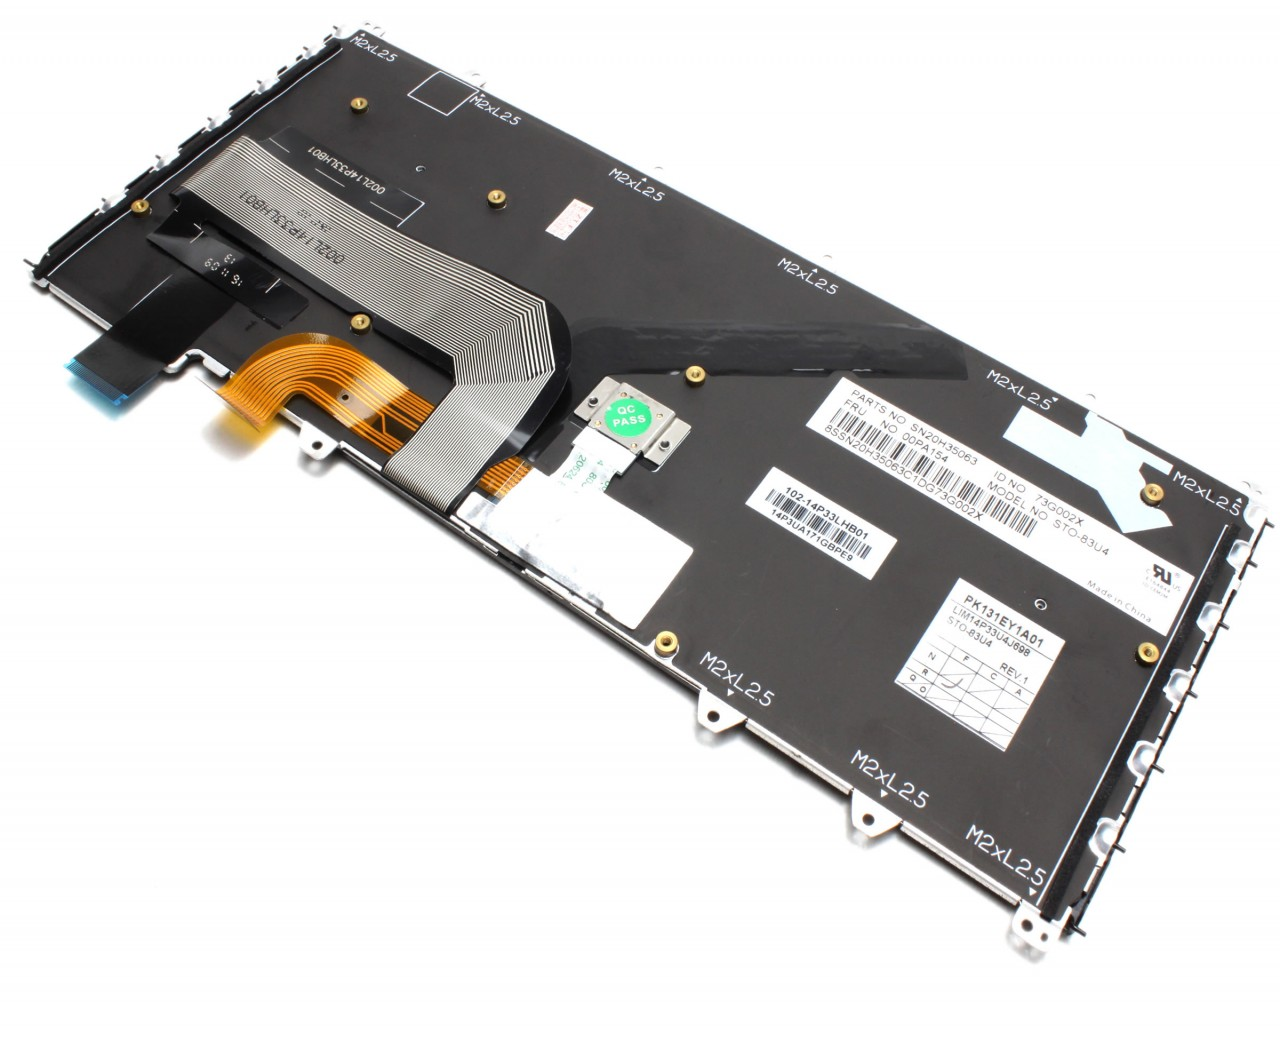 Tastatura Lenovo 14P3UA171GBPE9 neagra cu rama argintie iluminata backlit imagine powerlaptop.ro 2021